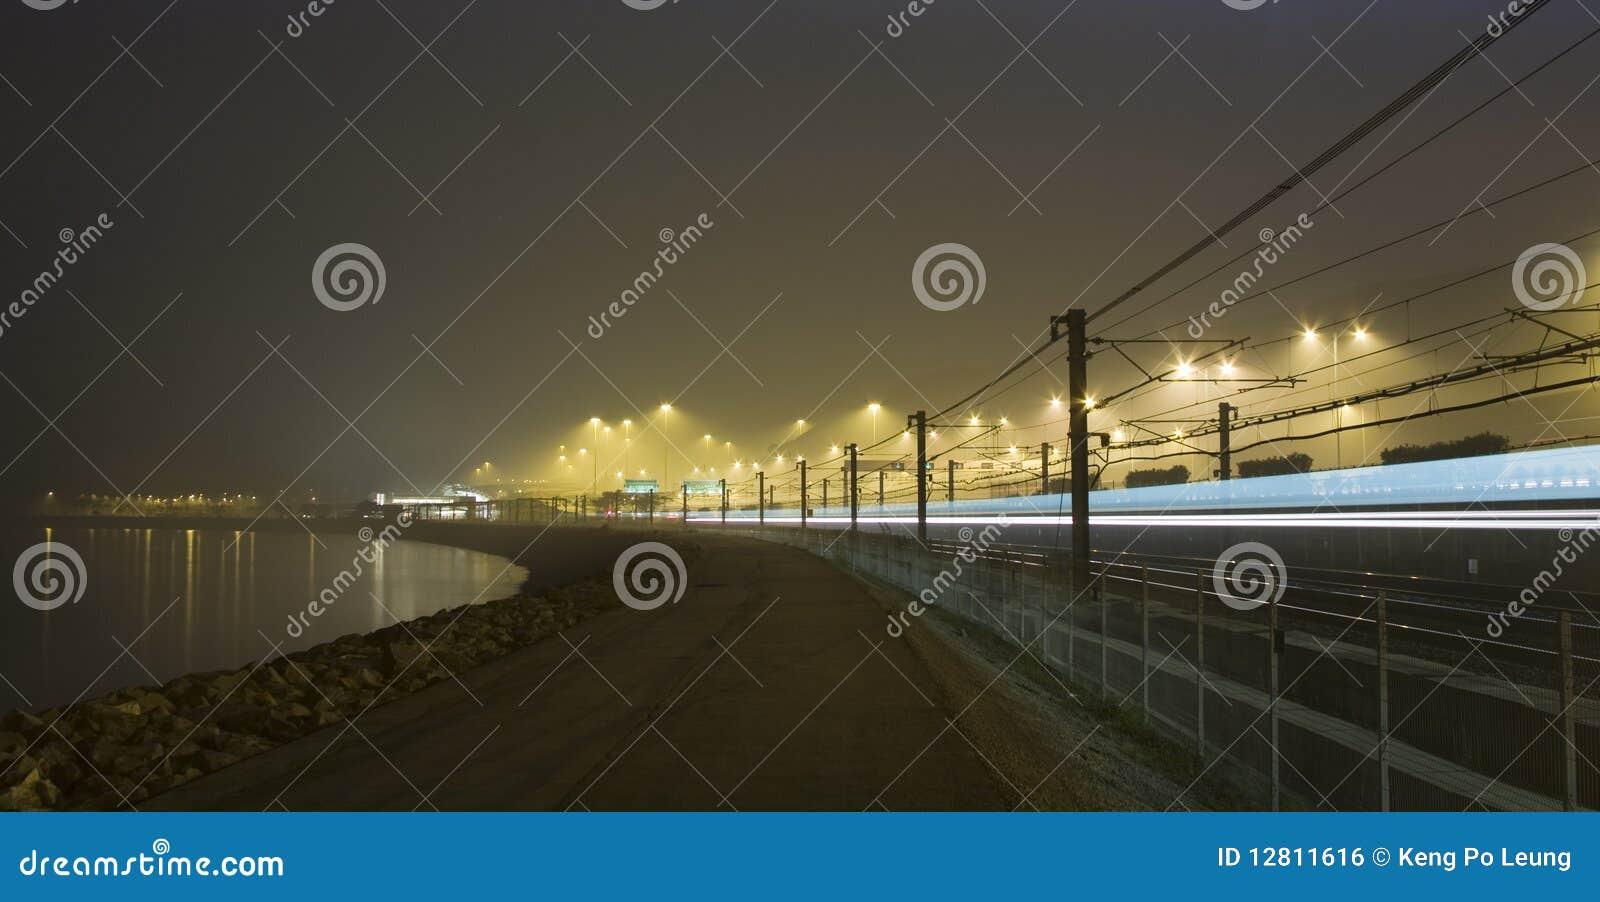 Estrada de ferro e lago